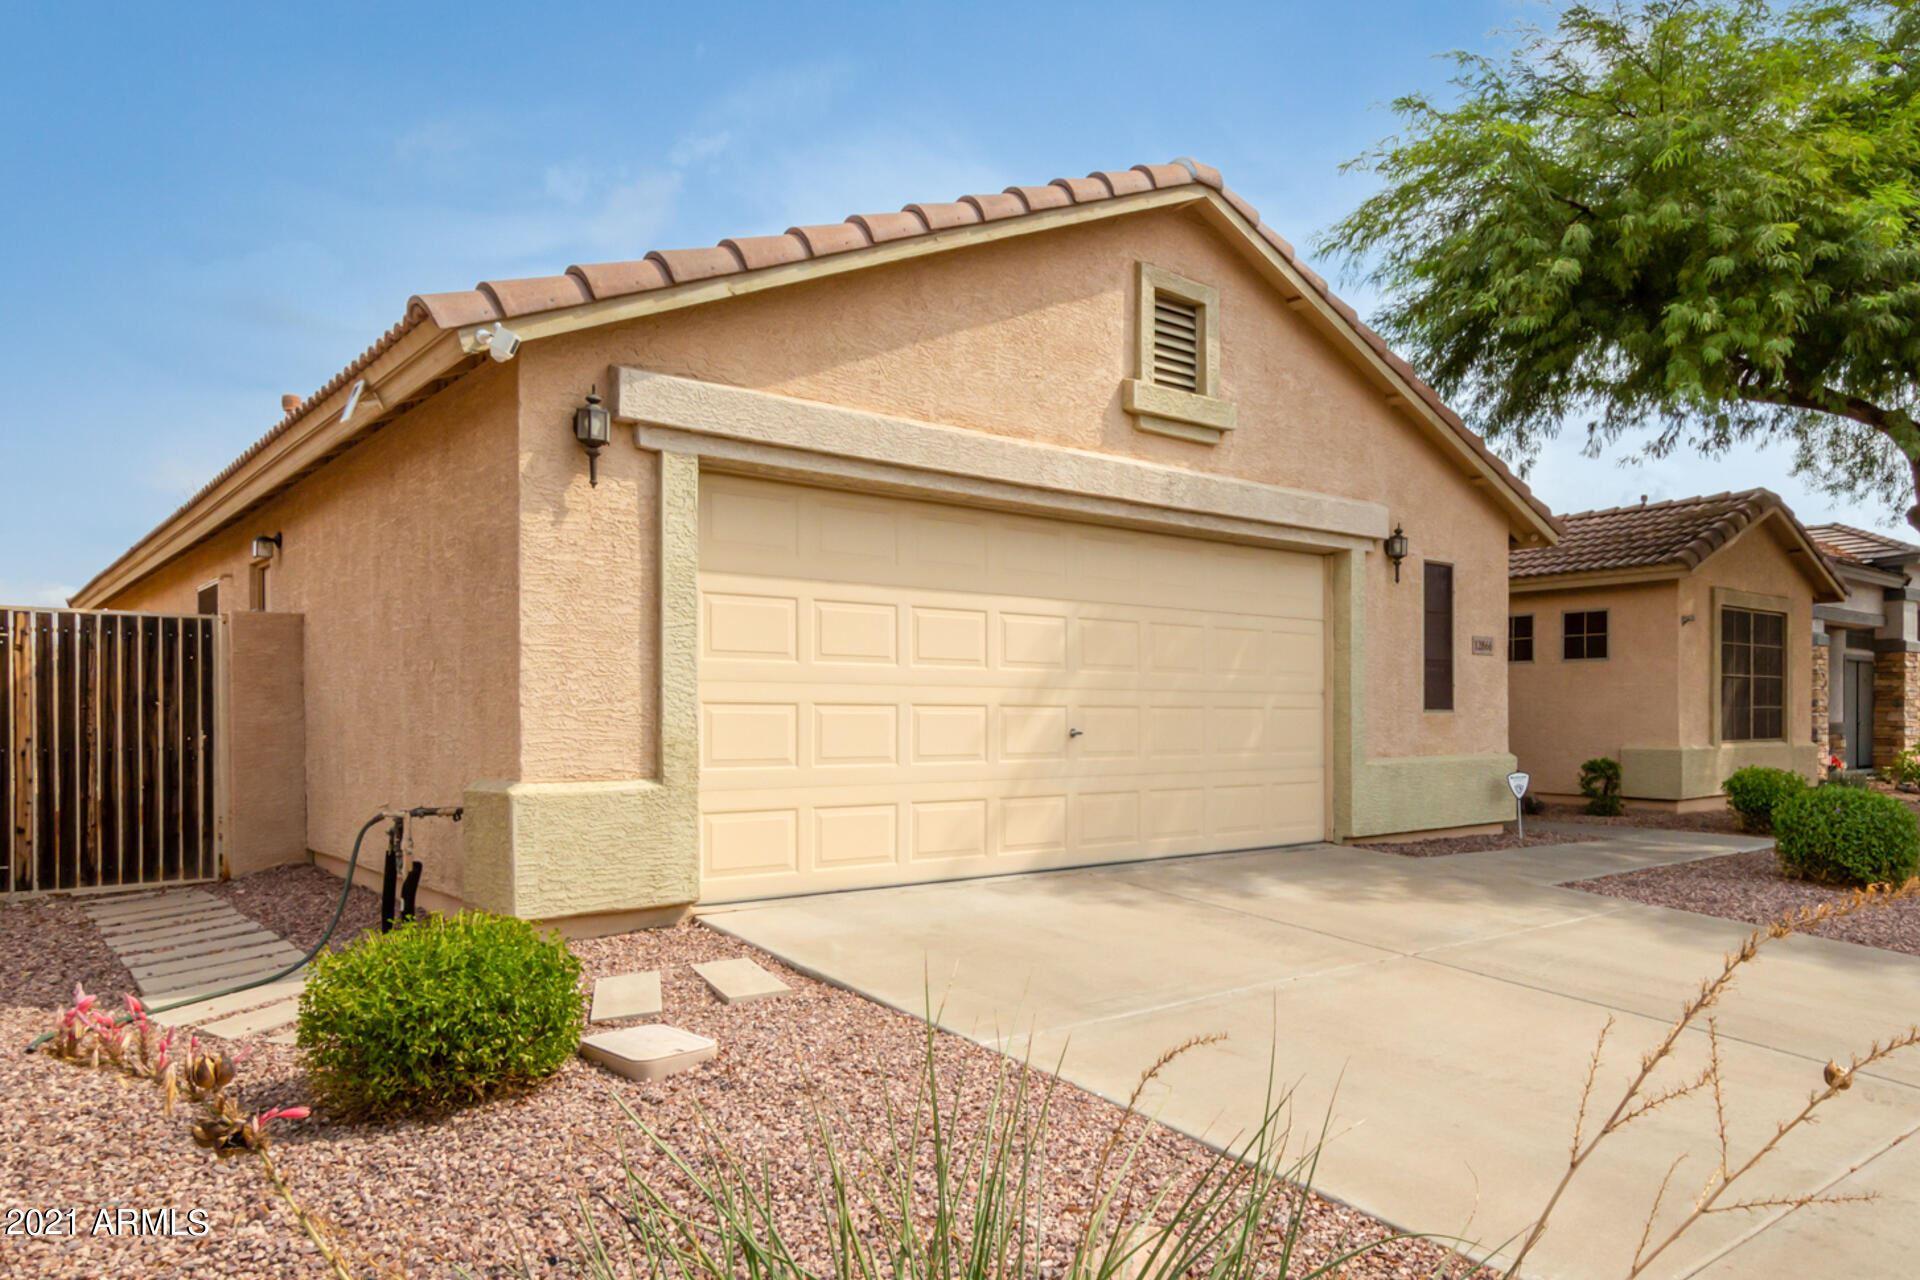 Photo of 12866 W WINDROSE Drive, El Mirage, AZ 85335 (MLS # 6300765)